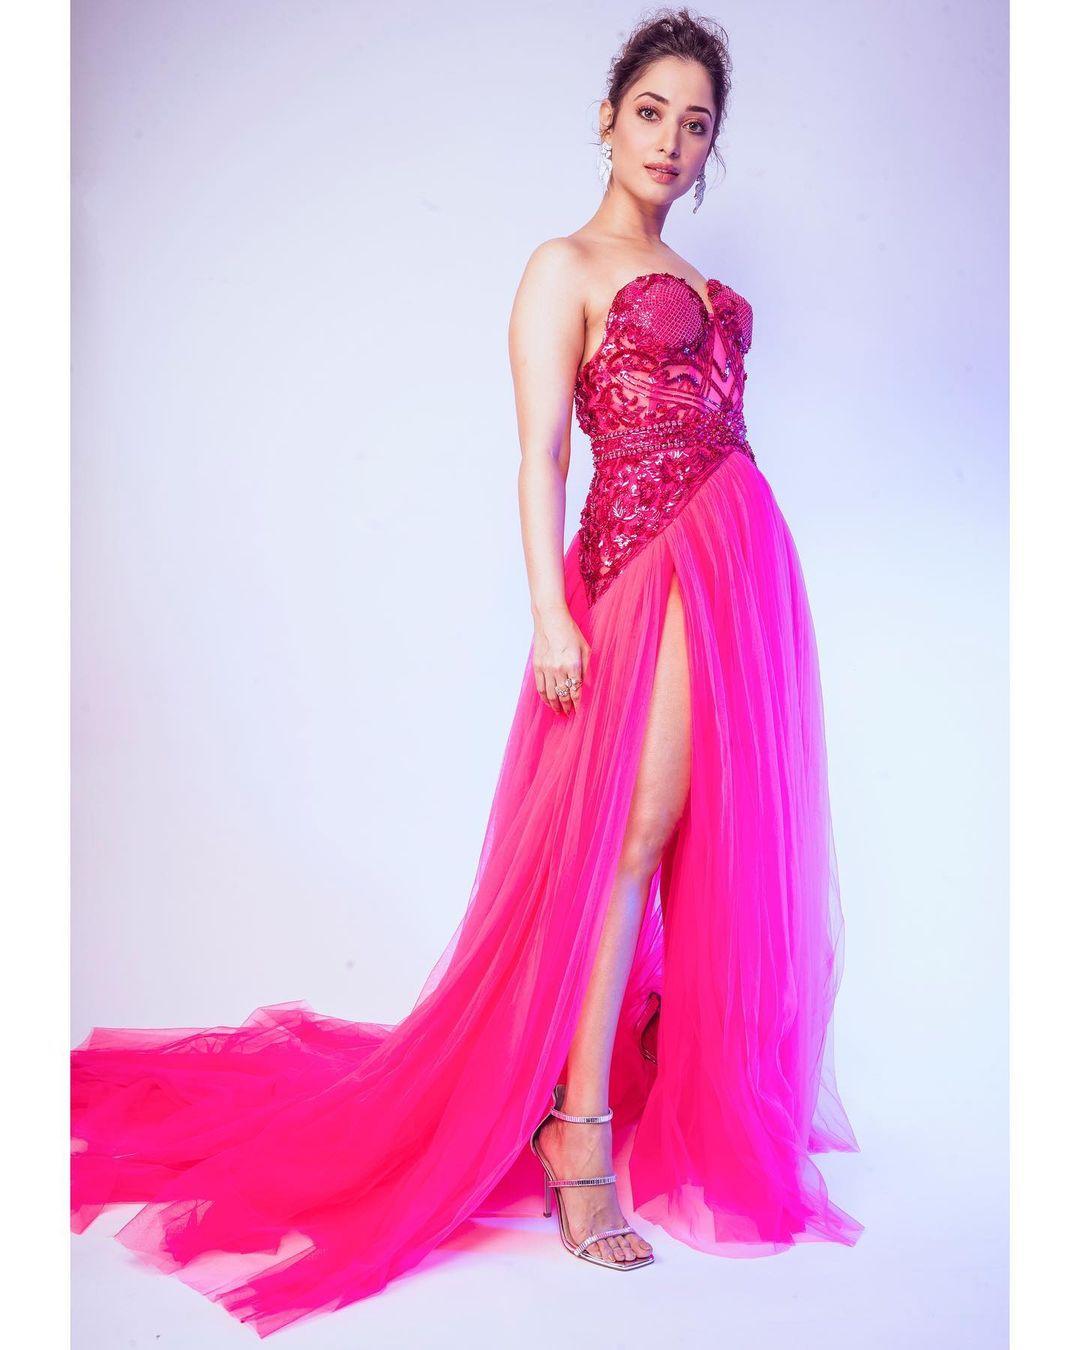 Tamannaah Bhatia looks breathtaking in the pink gown. (Image: Instagram)